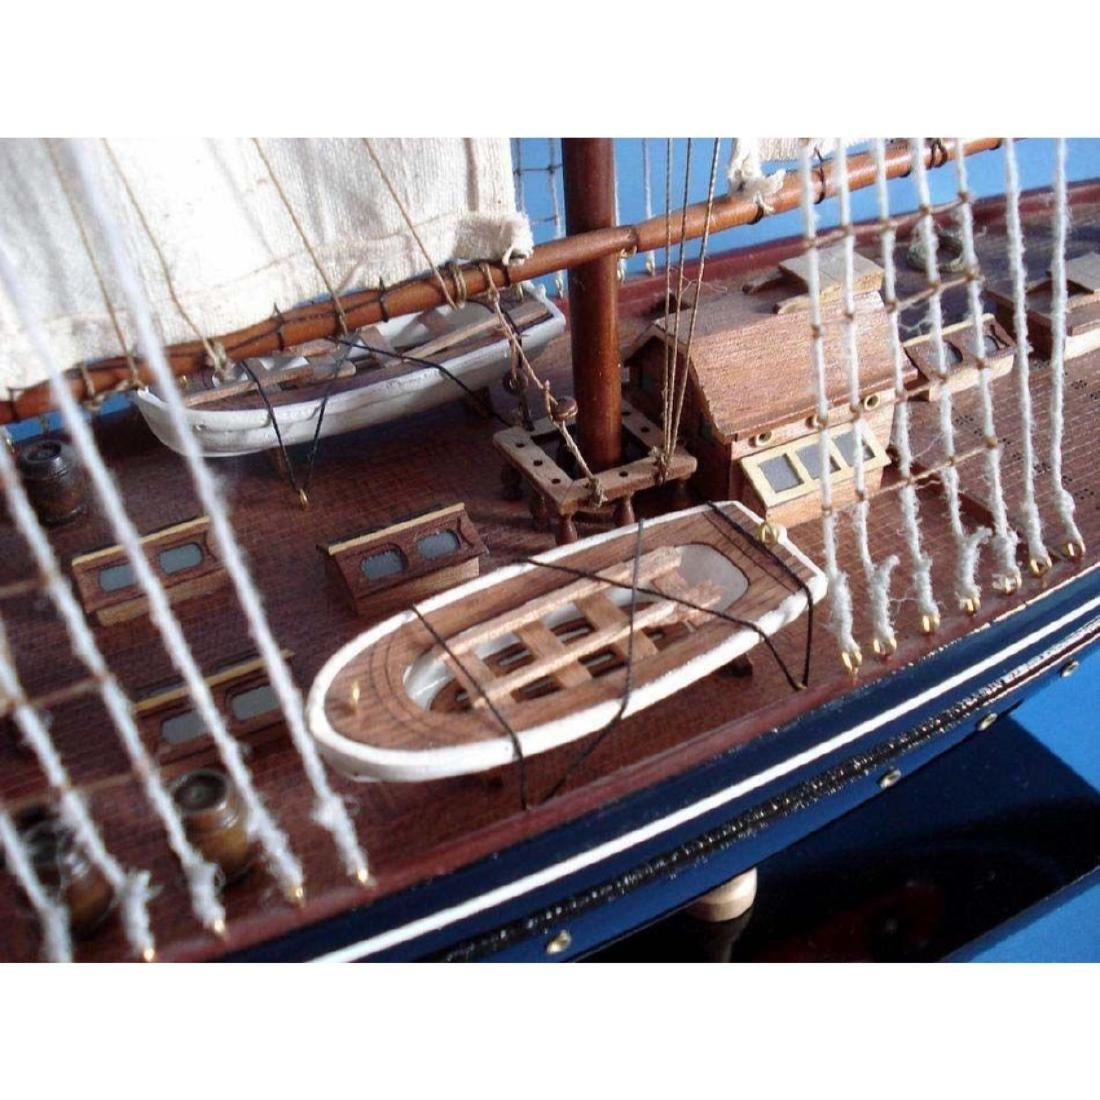 "Wooden Atlantic Limited Model Sailboat 32"" - 7"